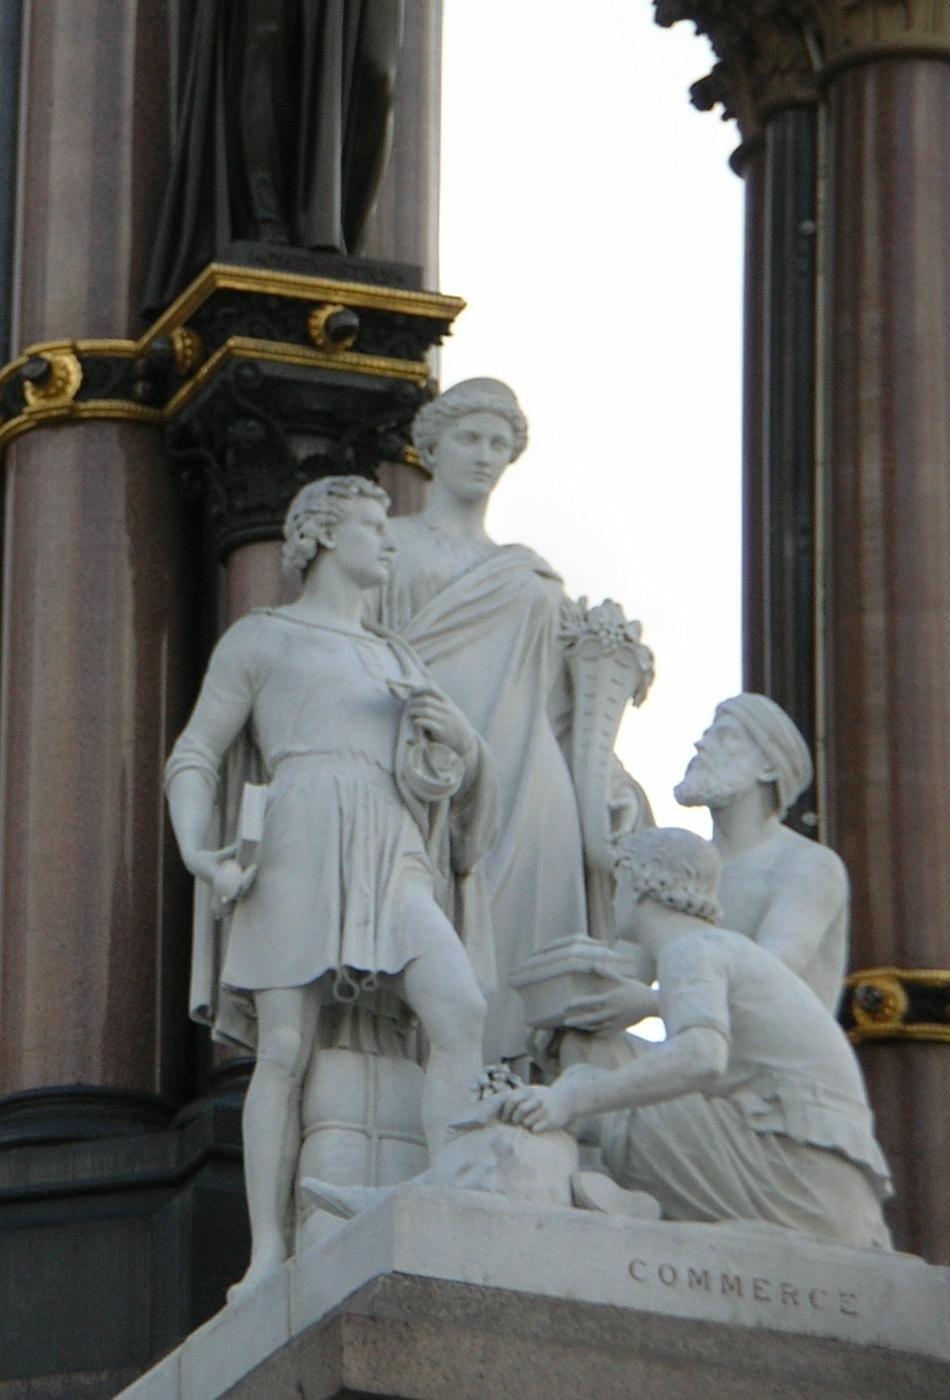 Commerce group (Albert Memorial)